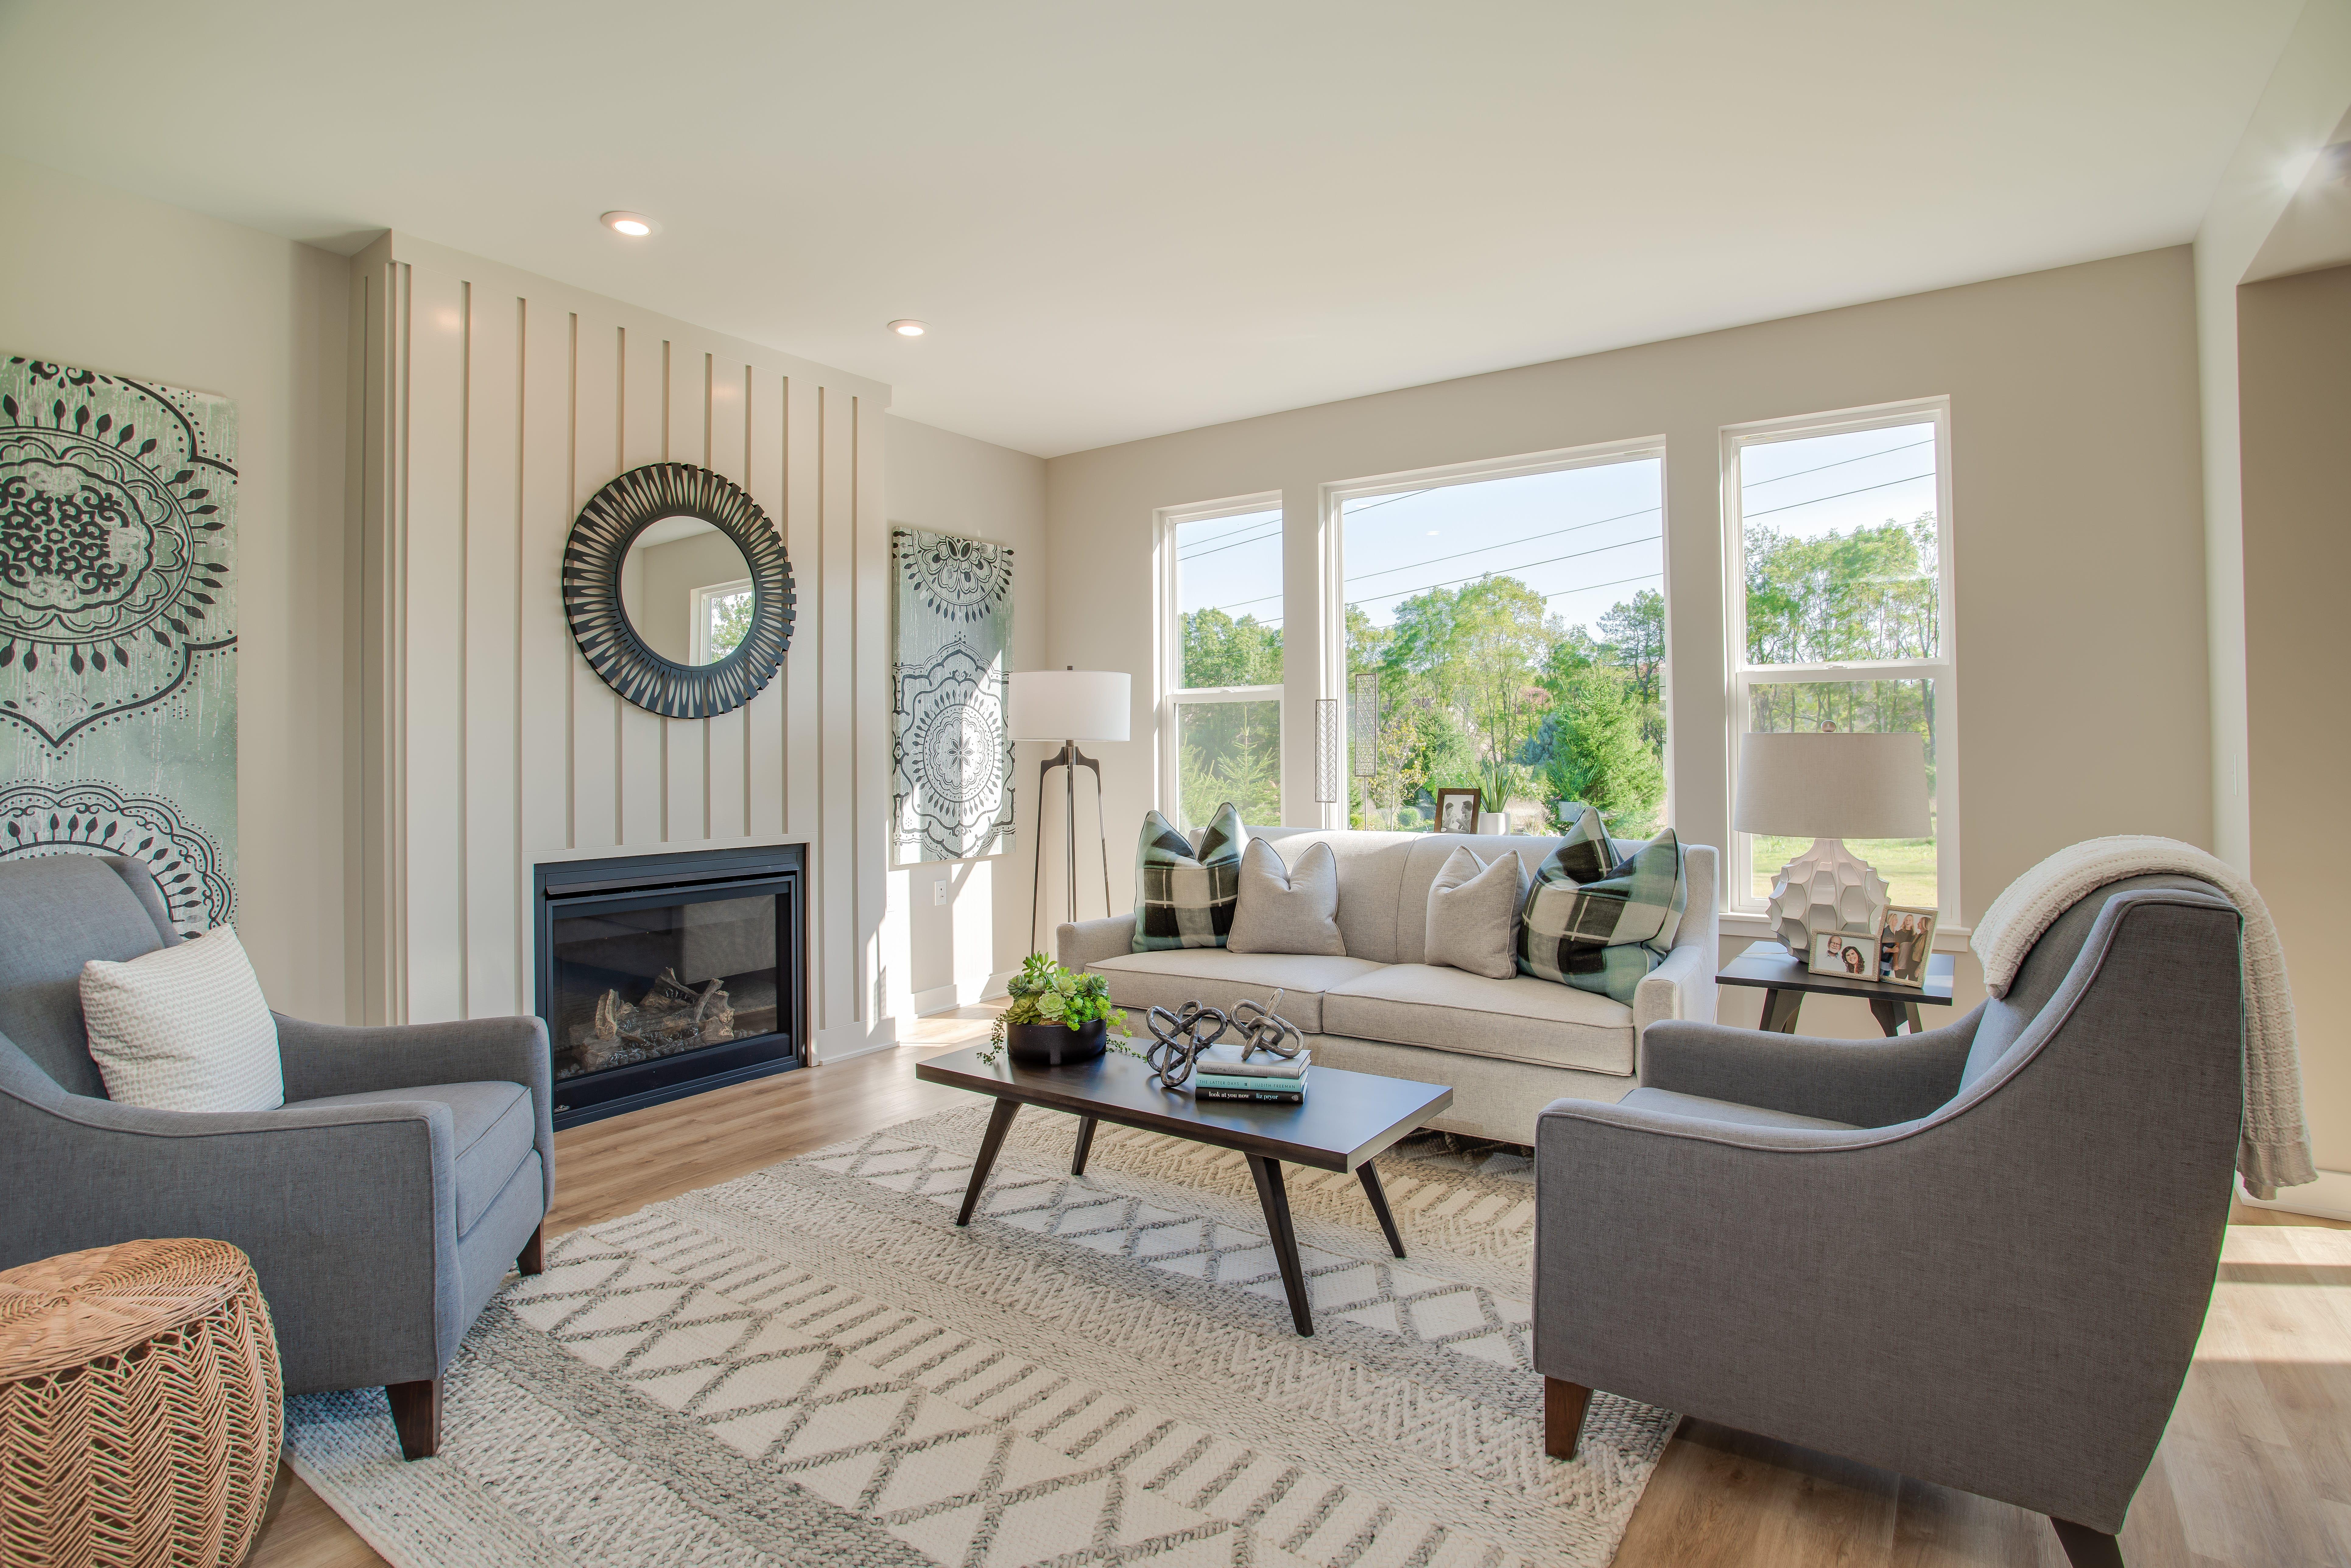 Shiplap fireplace surround, luxury vinyl plank floors in